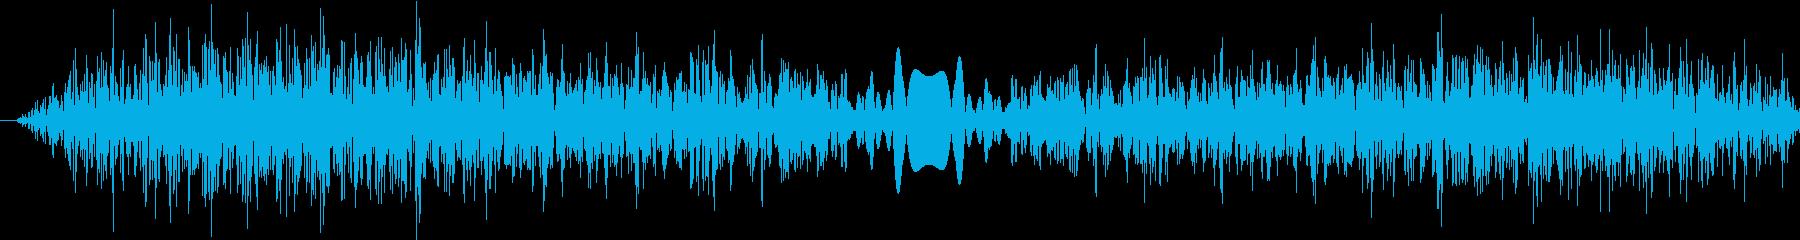 DJプレイ スクラッチ・ノイズ 1の再生済みの波形